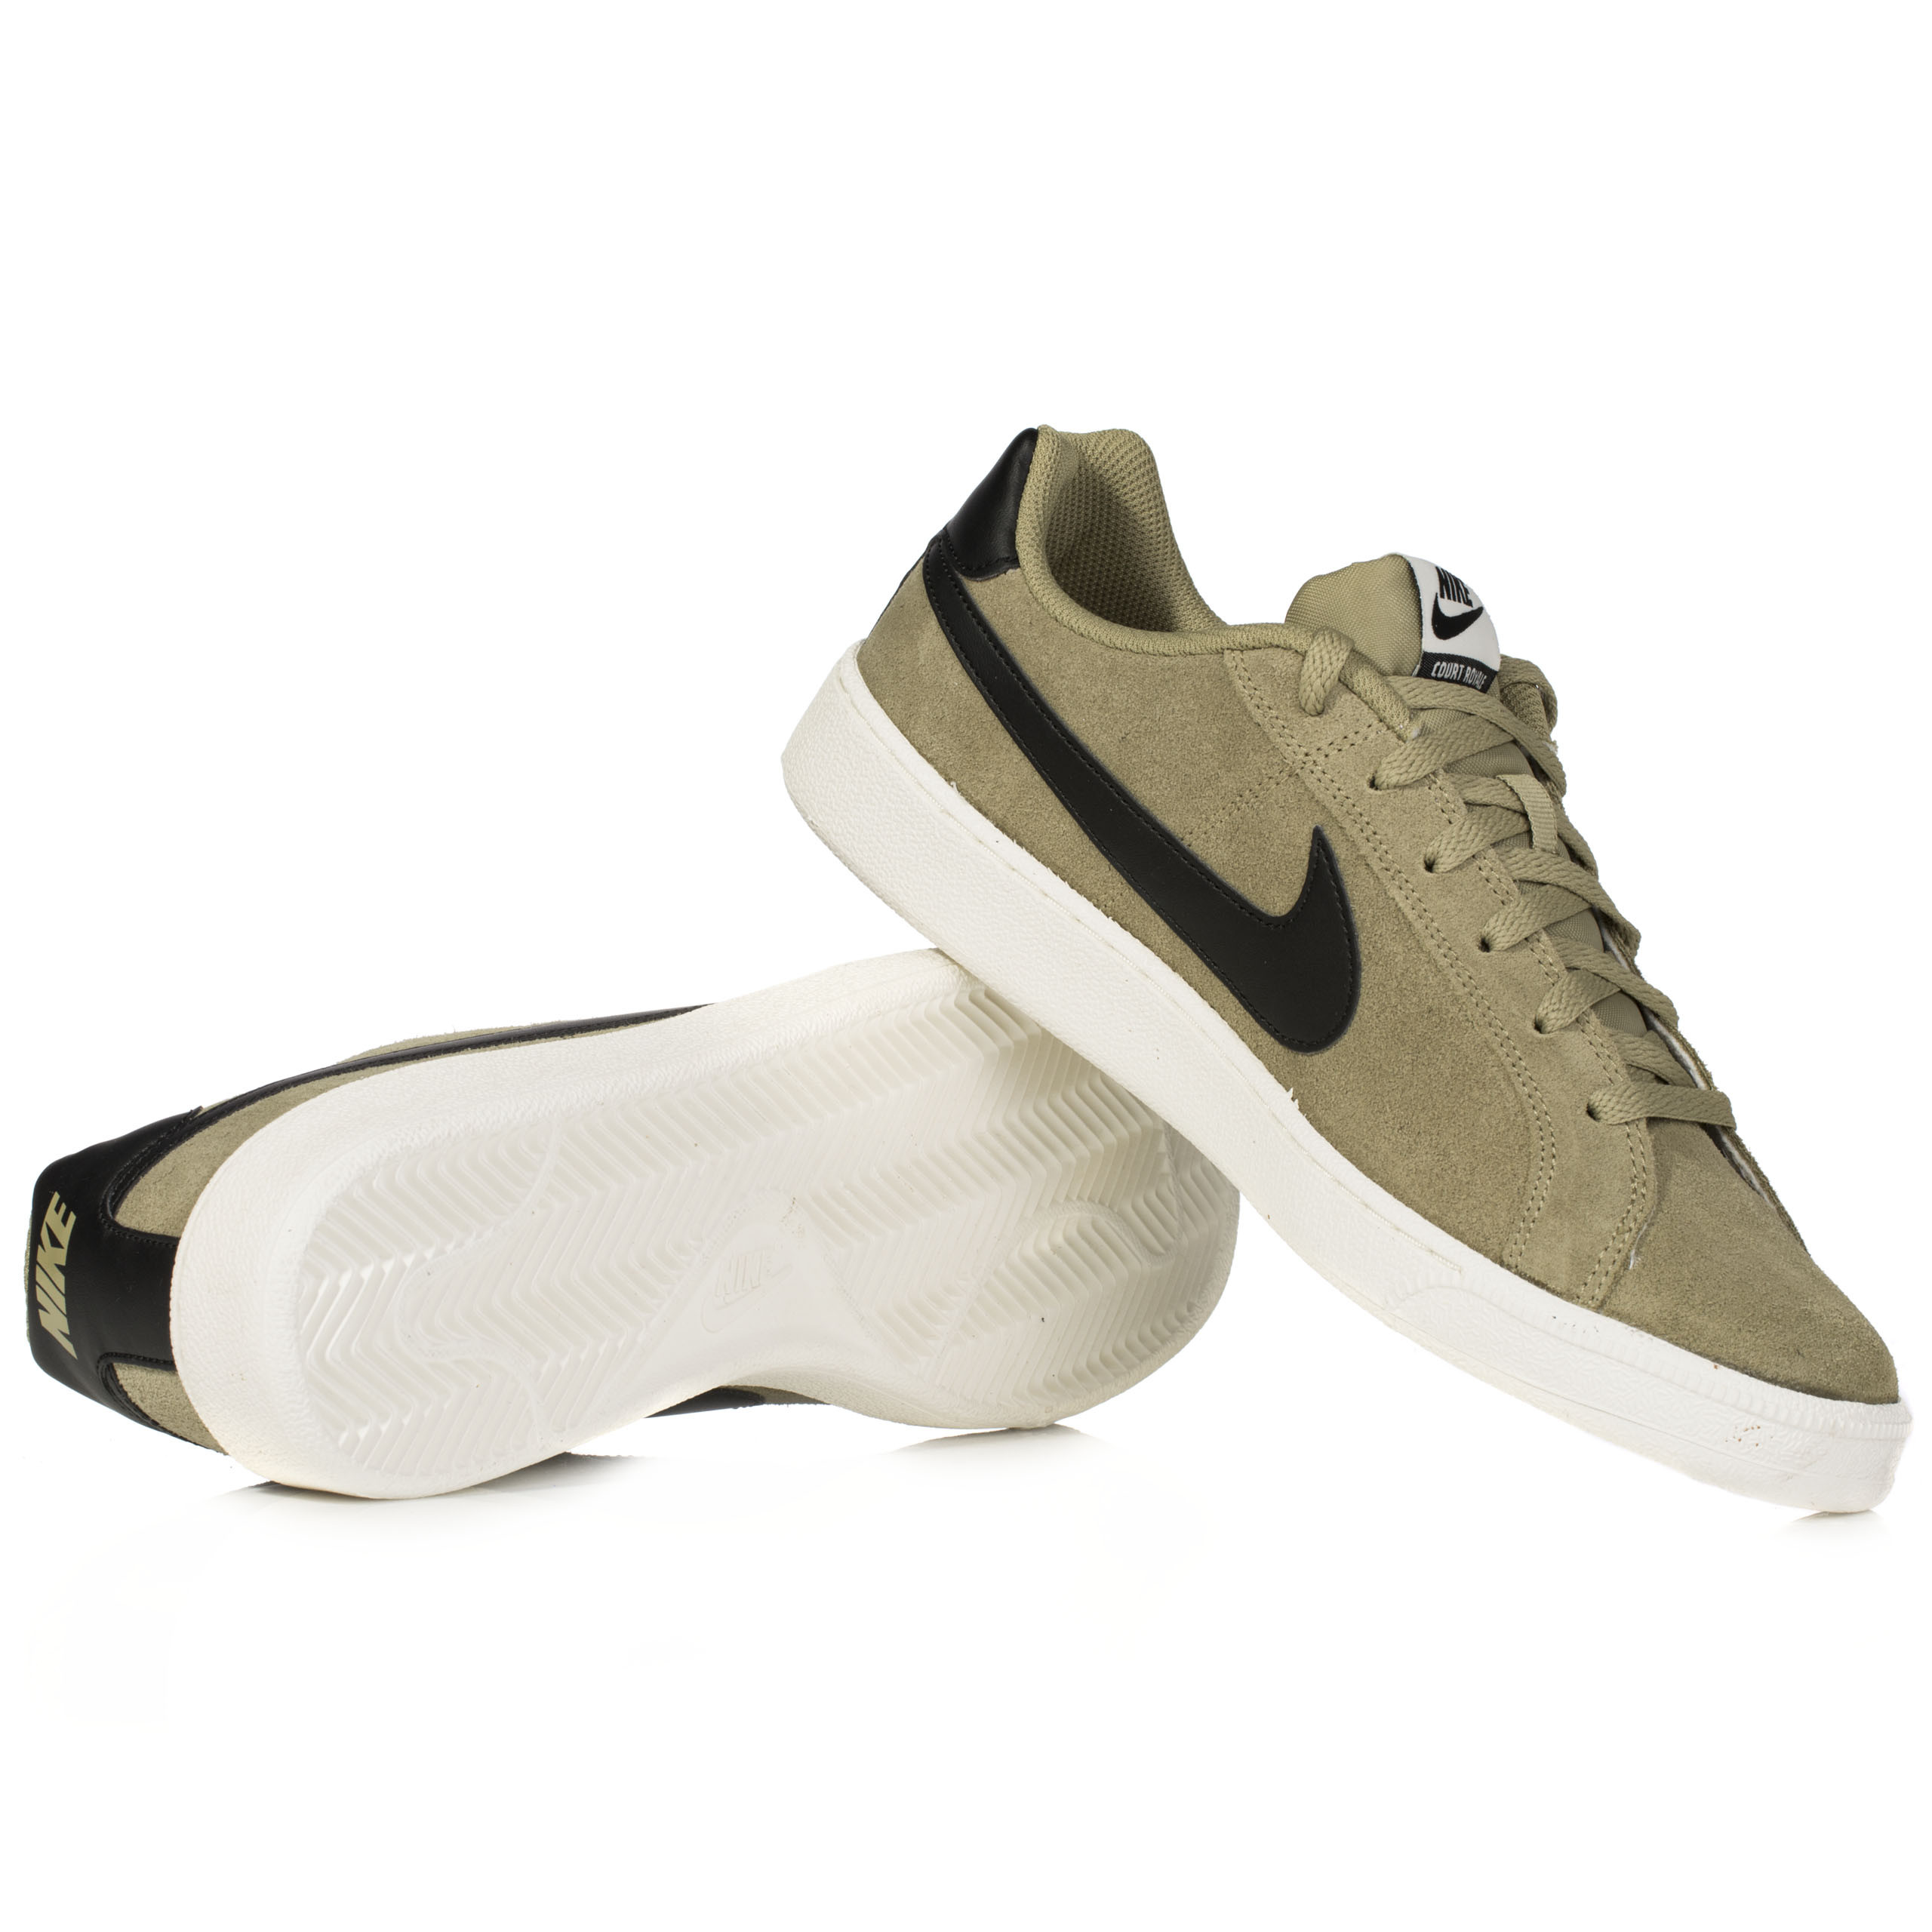 9391de79c278 Buty męskie Nike Court Royale Suede 819802-200 - 7251348601 ...